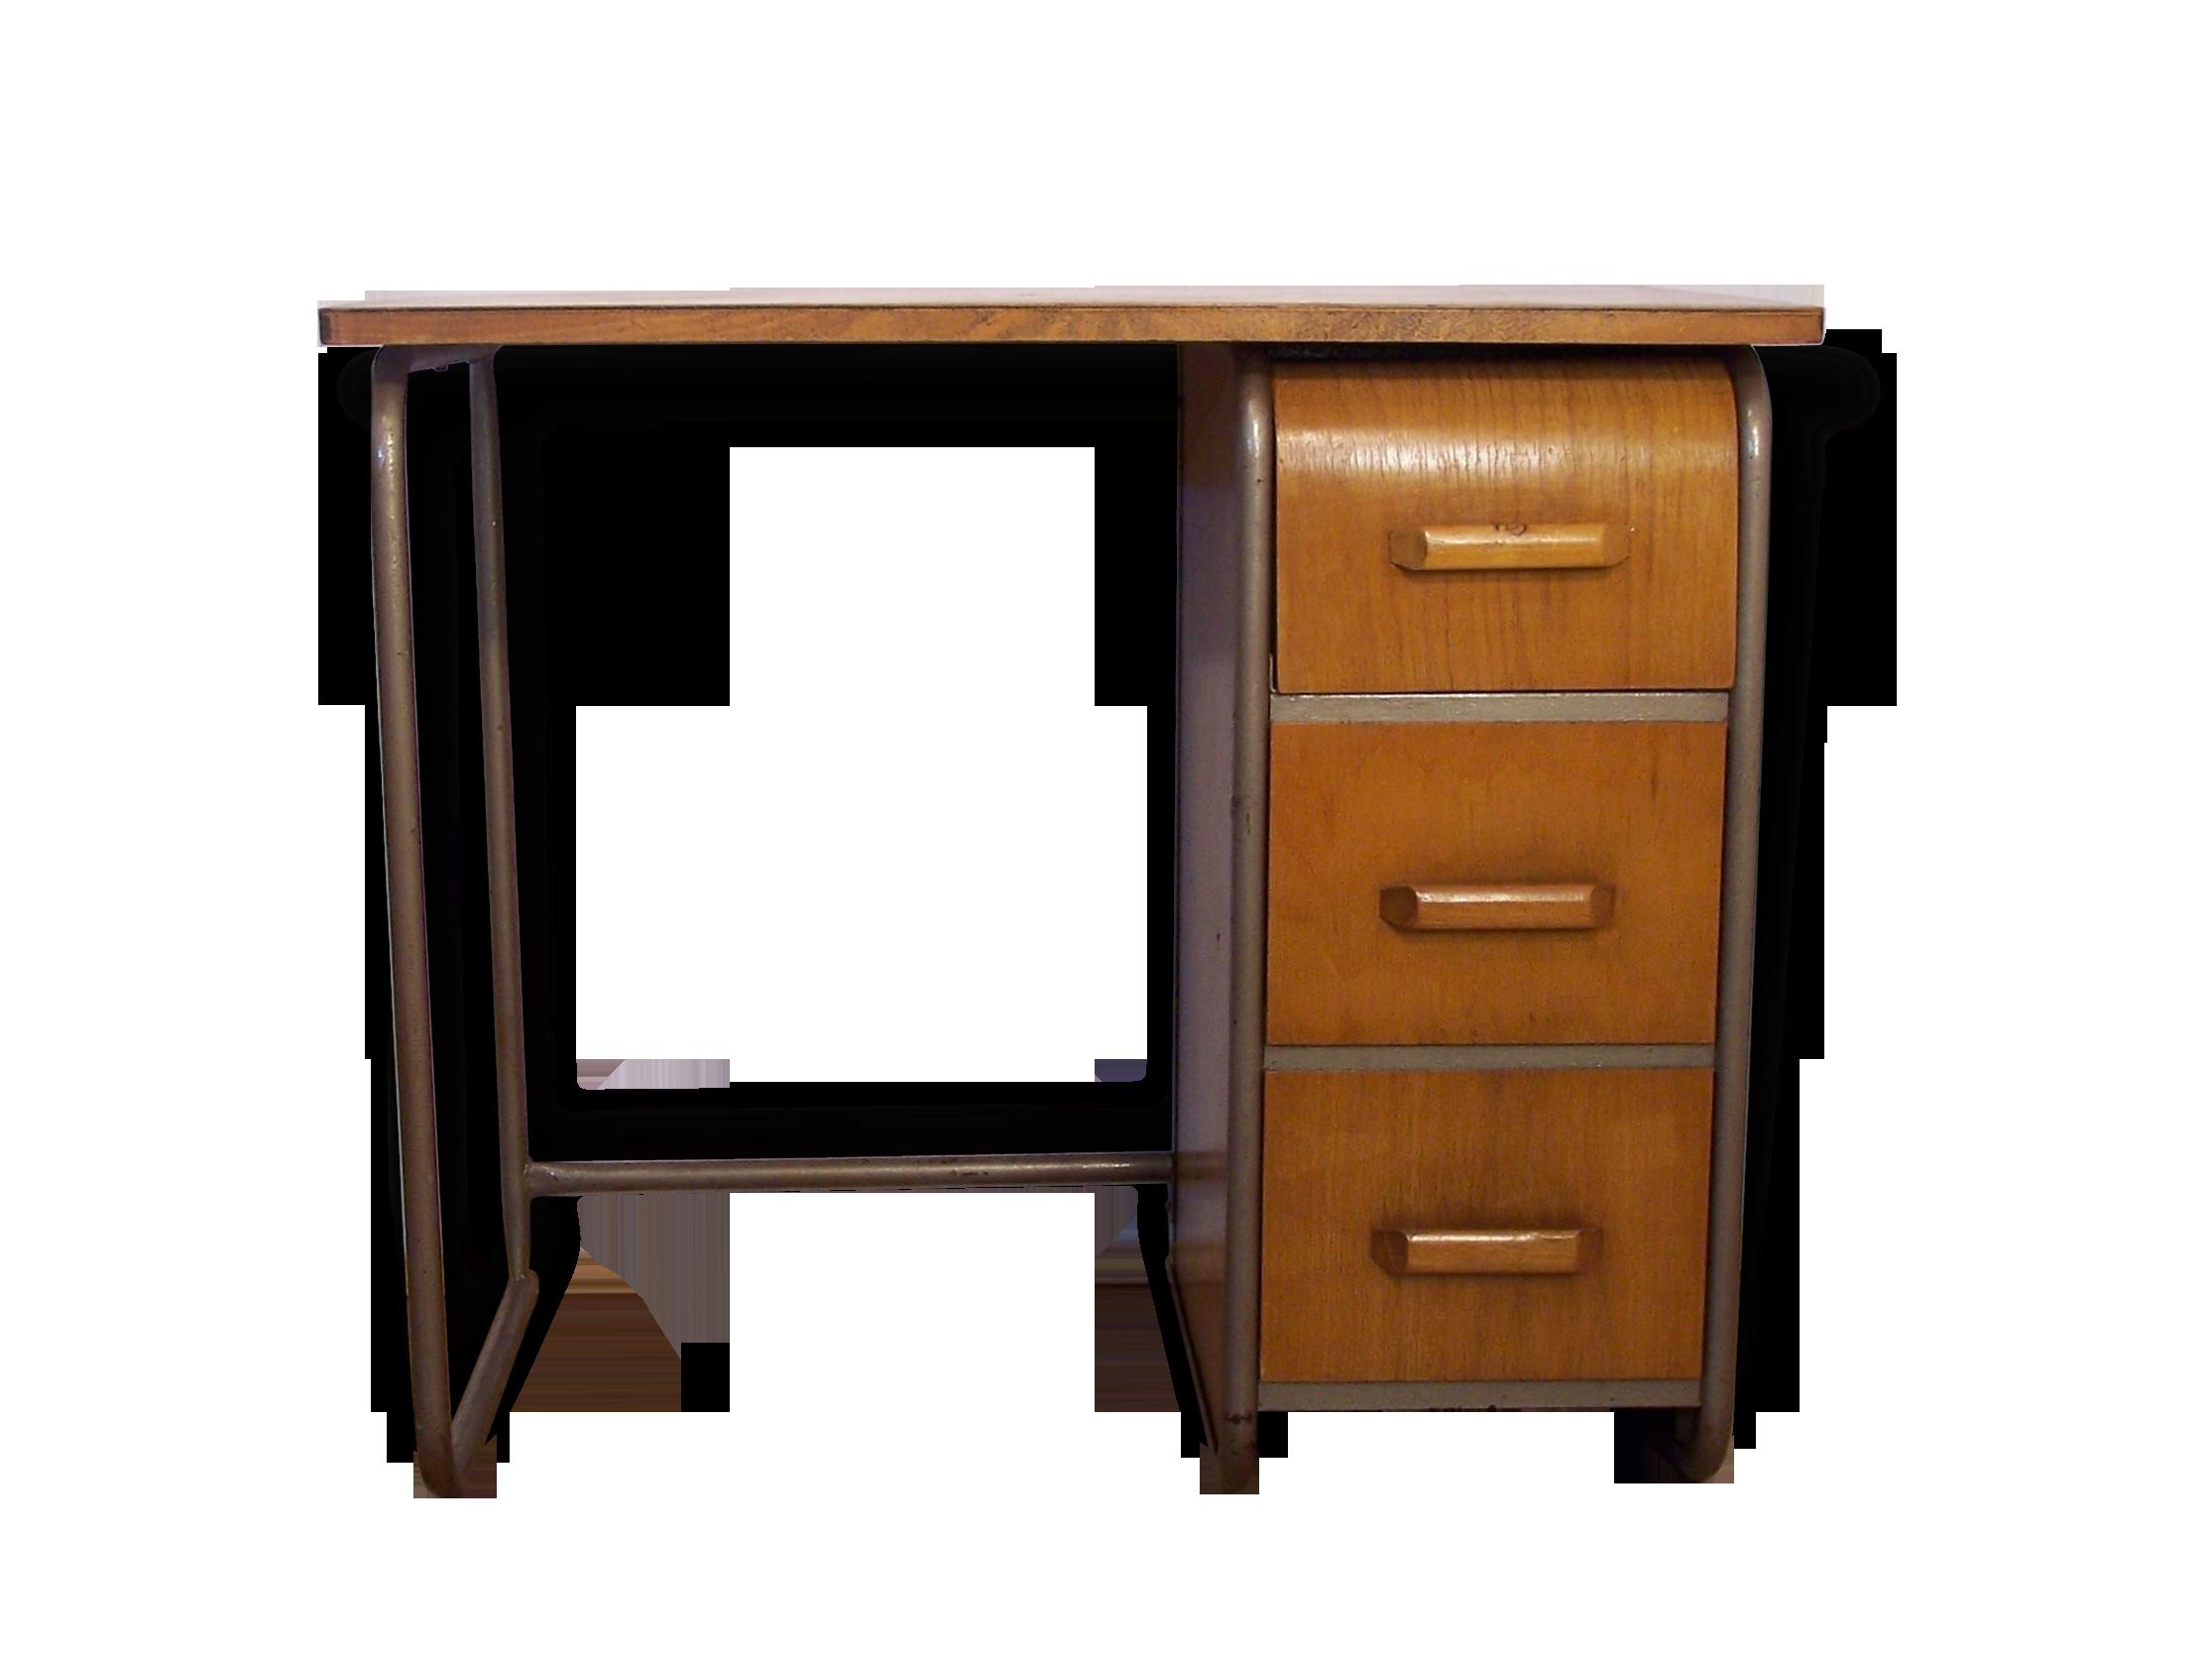 Bureau bois et métal tiroir arrondi bois matériau bois